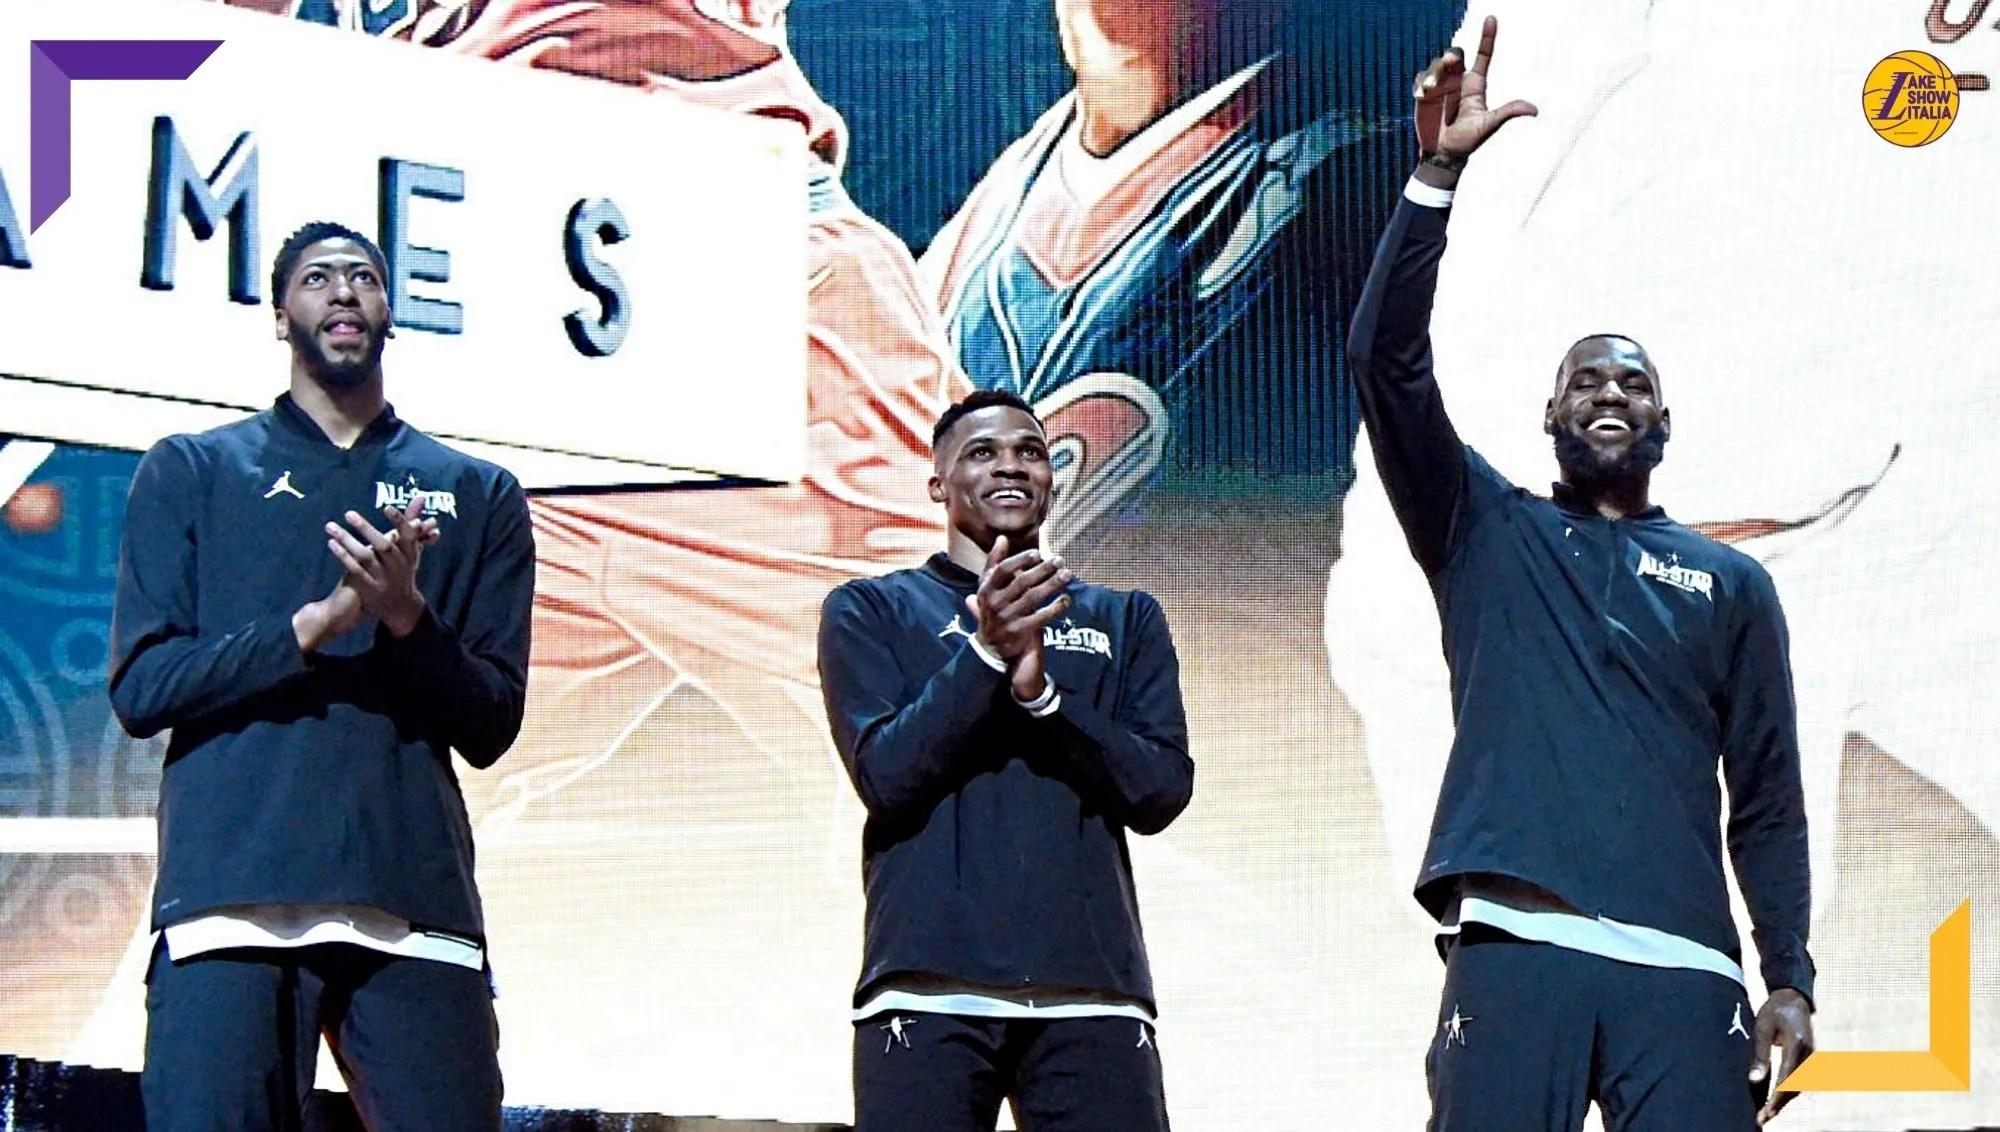 Russell Westbrook sarà la terza stella dei Los Angeles Lakers al fianco di LeBron James ed Anthony Davis. Agli Wizards Kuzma, Harrell e KCP.